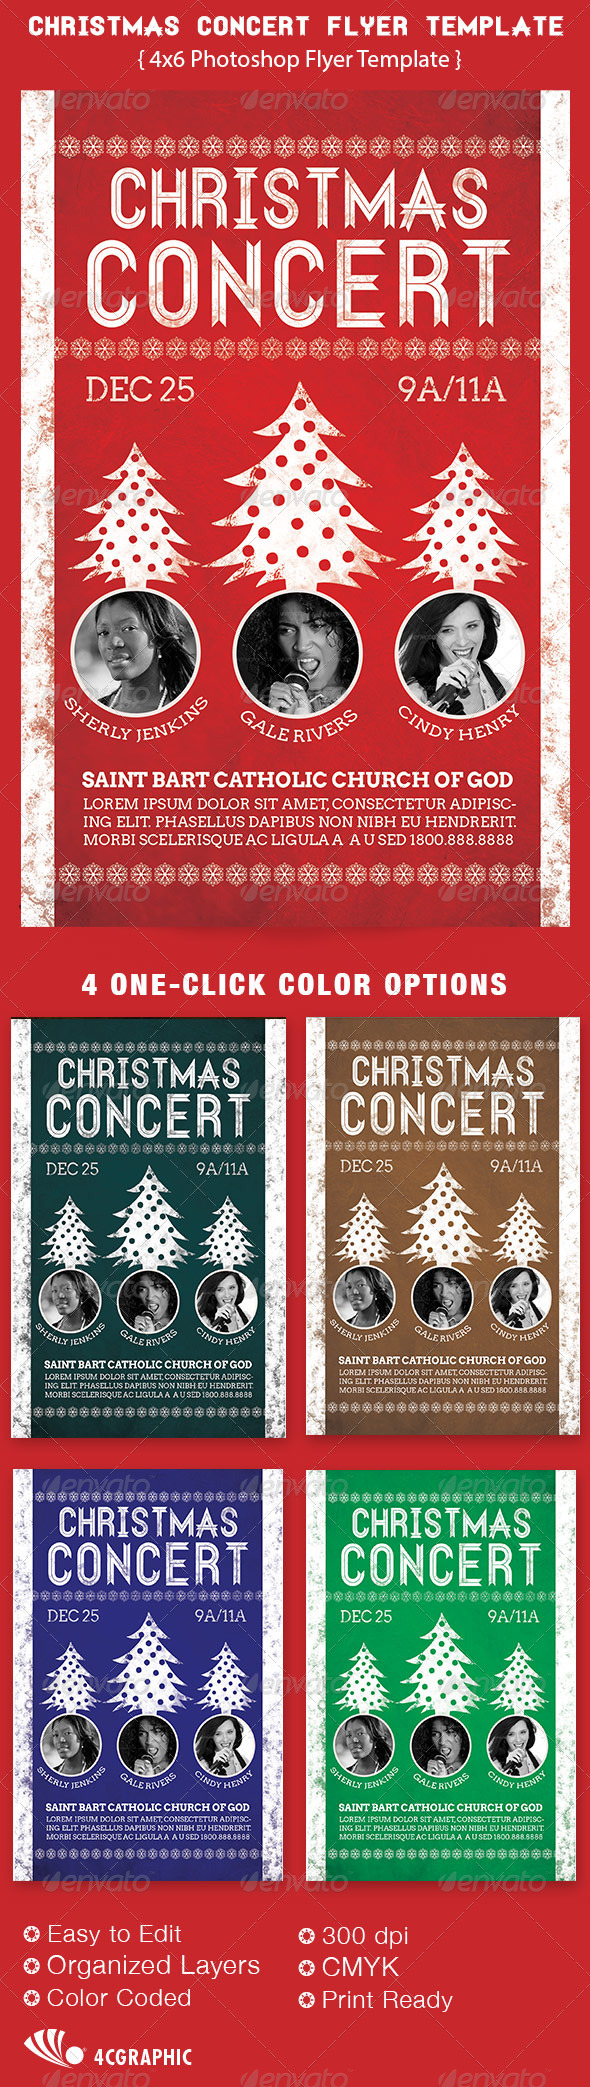 christmas concert flyer template graphicriver. Black Bedroom Furniture Sets. Home Design Ideas